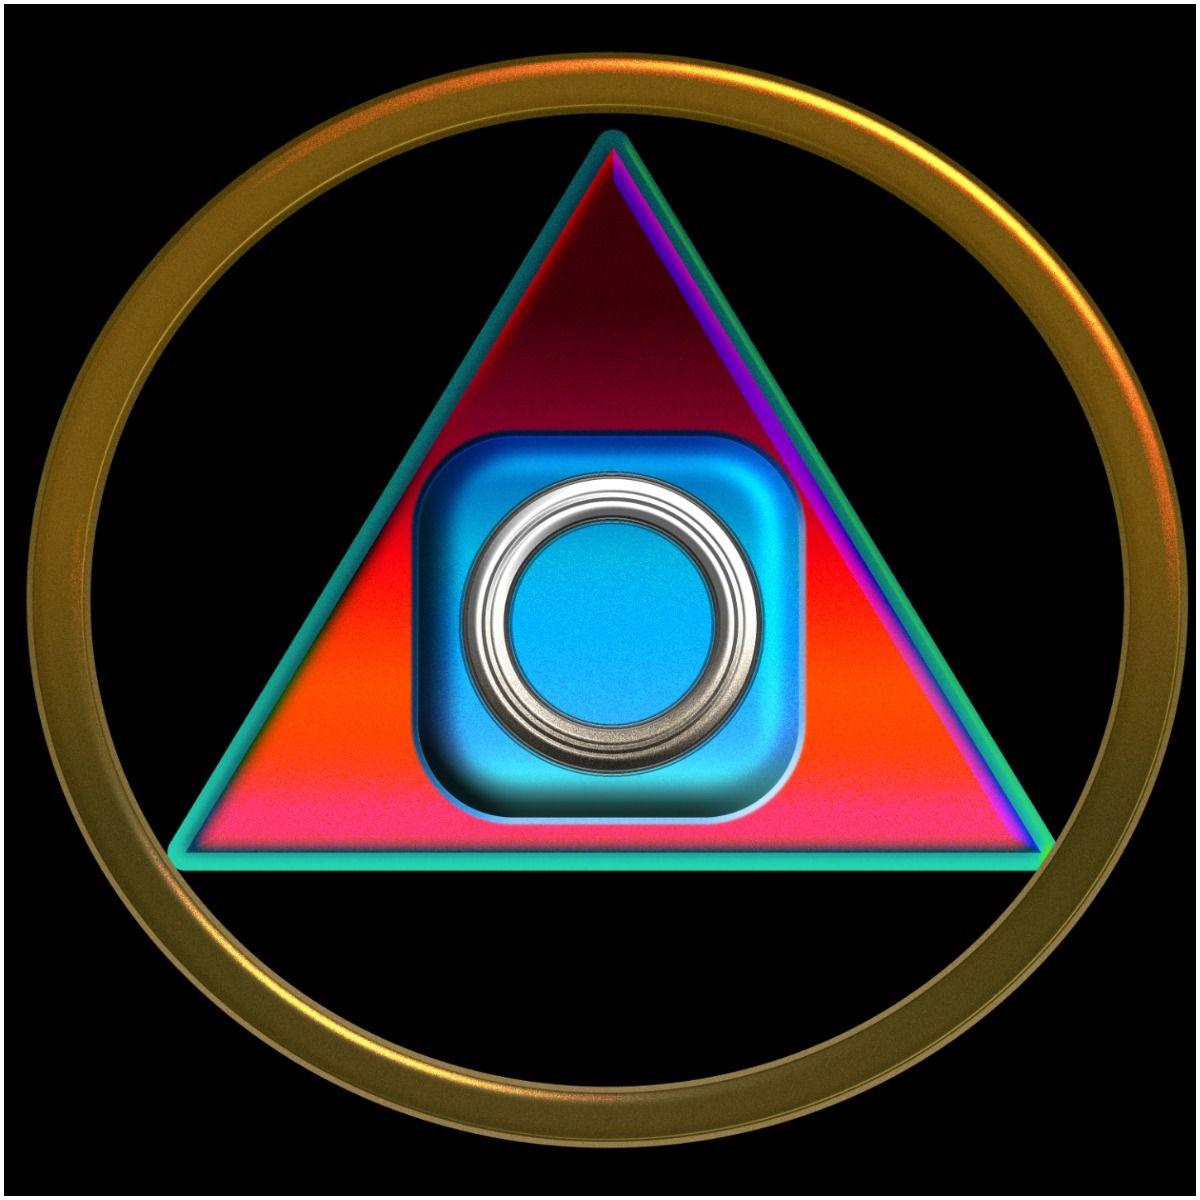 Philosopher's Stone symbol